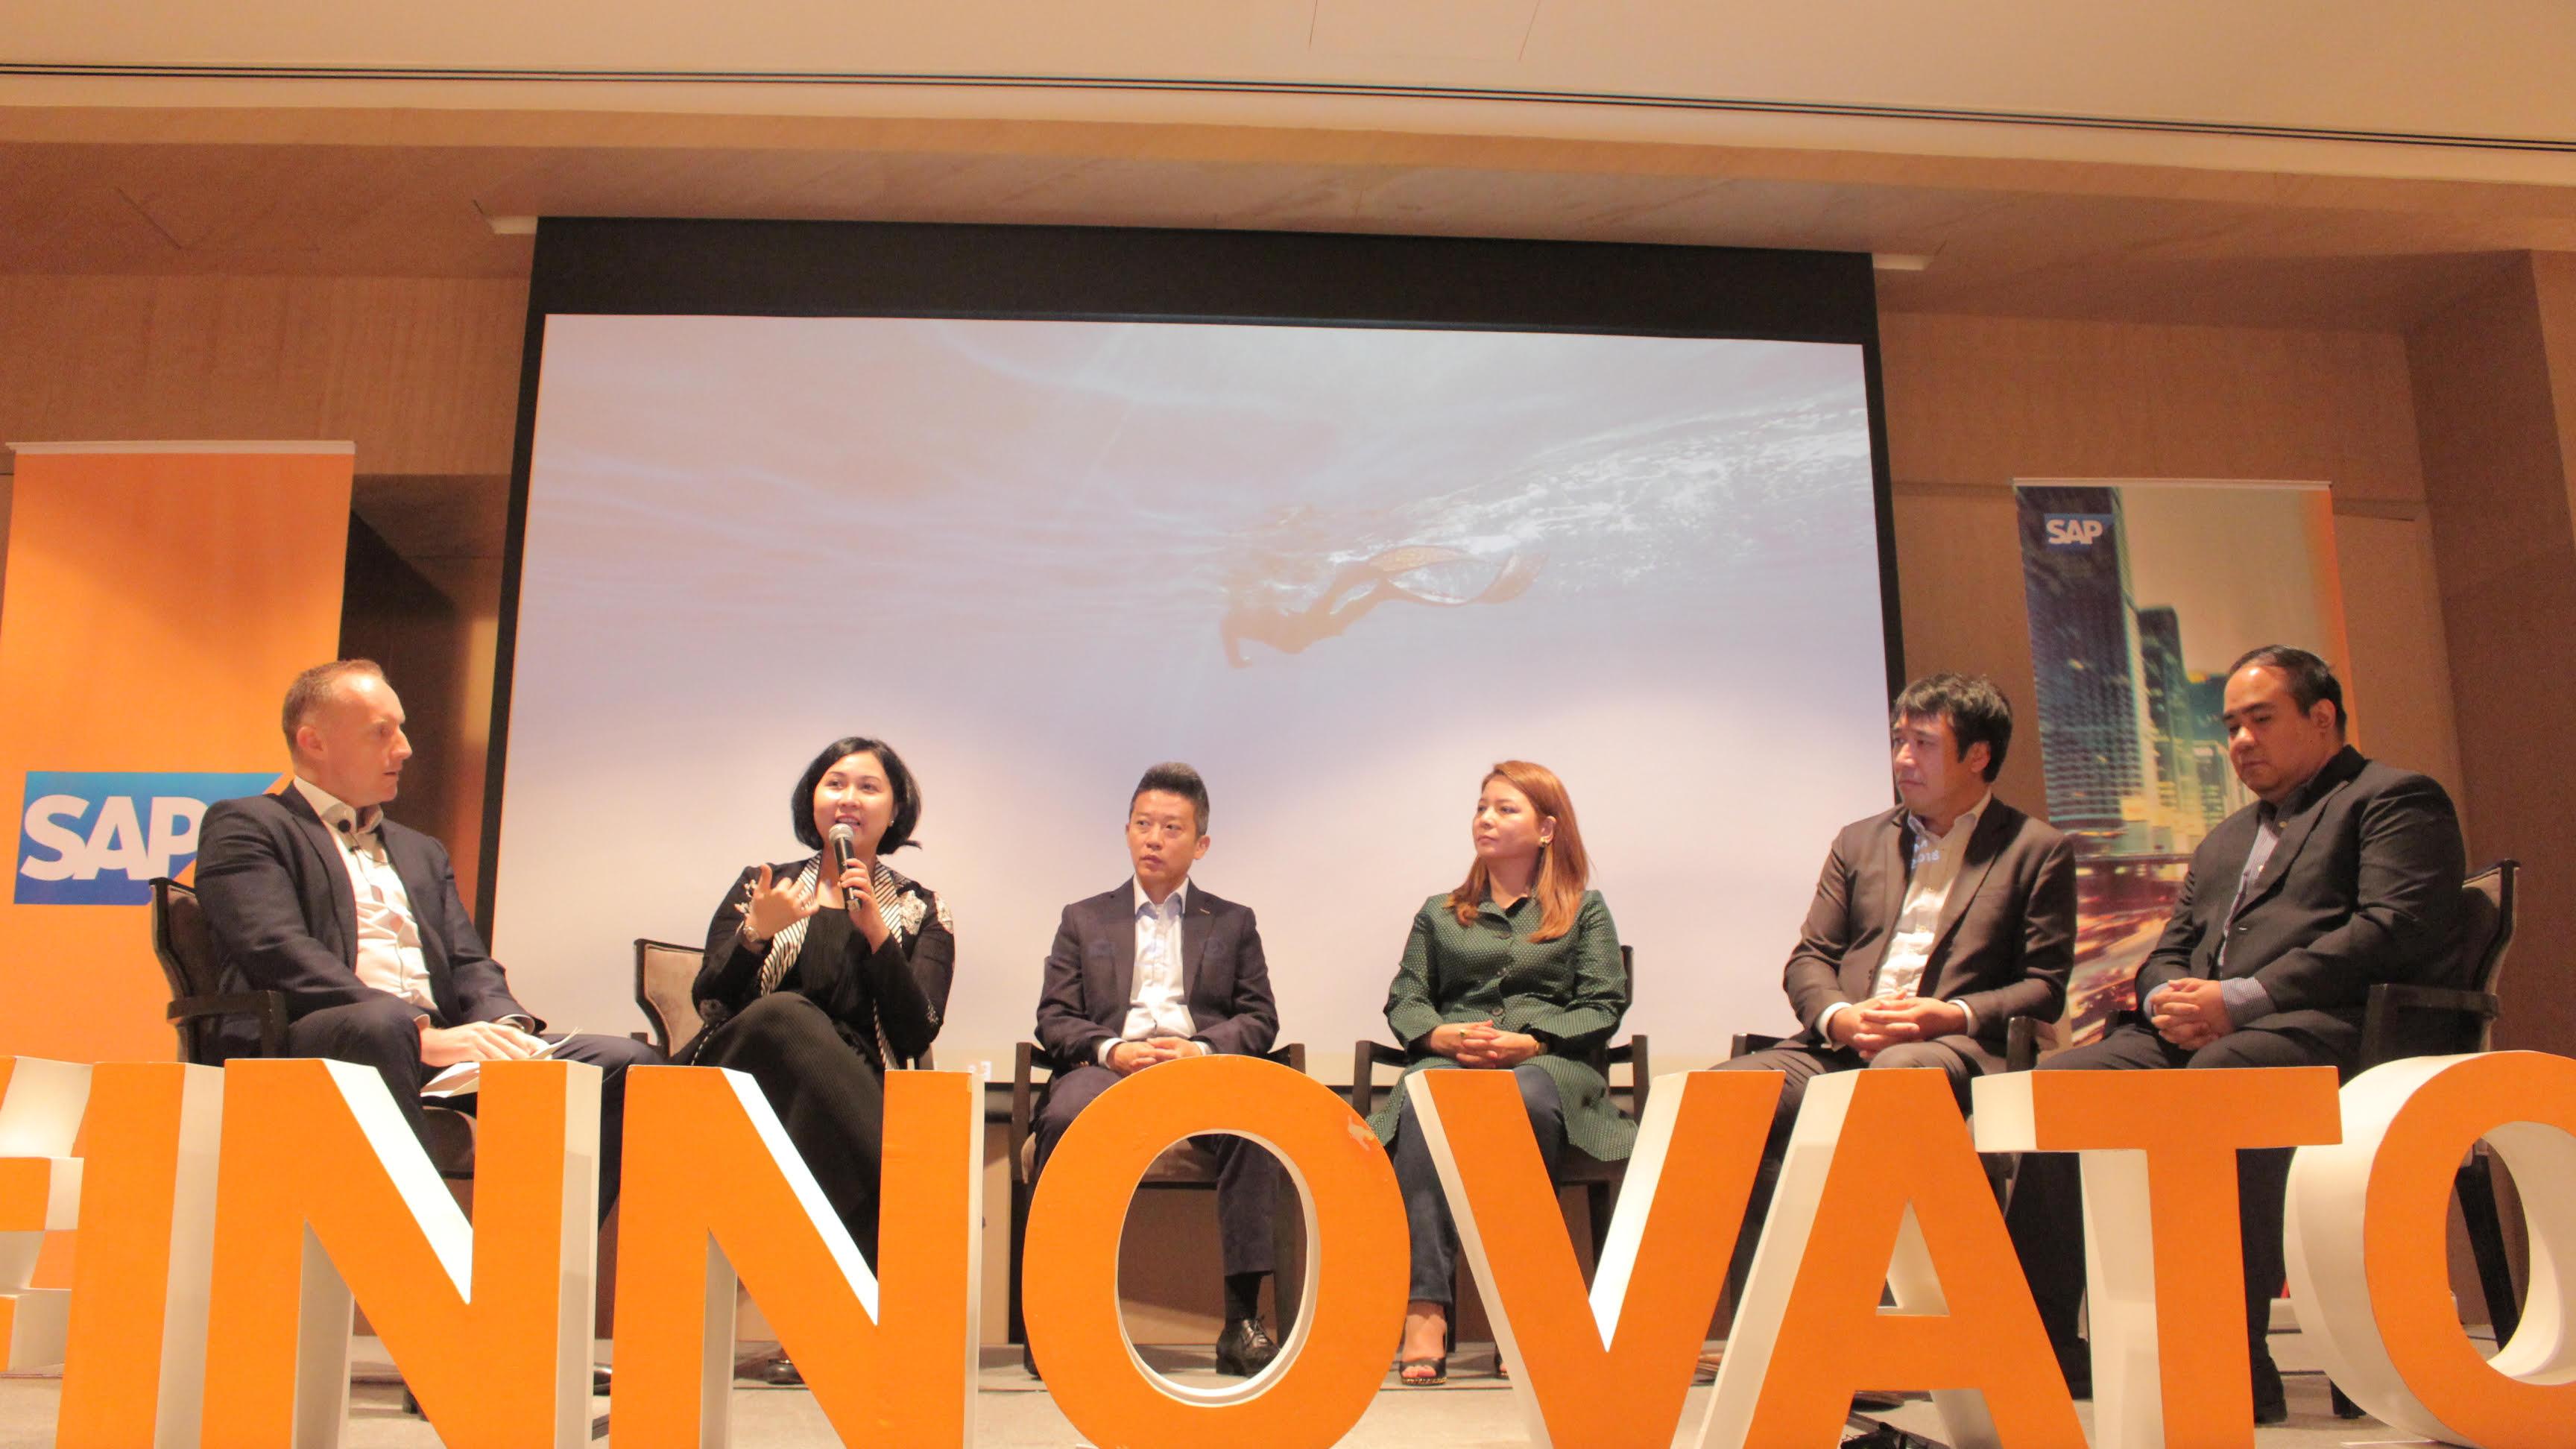 SAP Intelligent Enterprise leading SEA firms in their digital journey